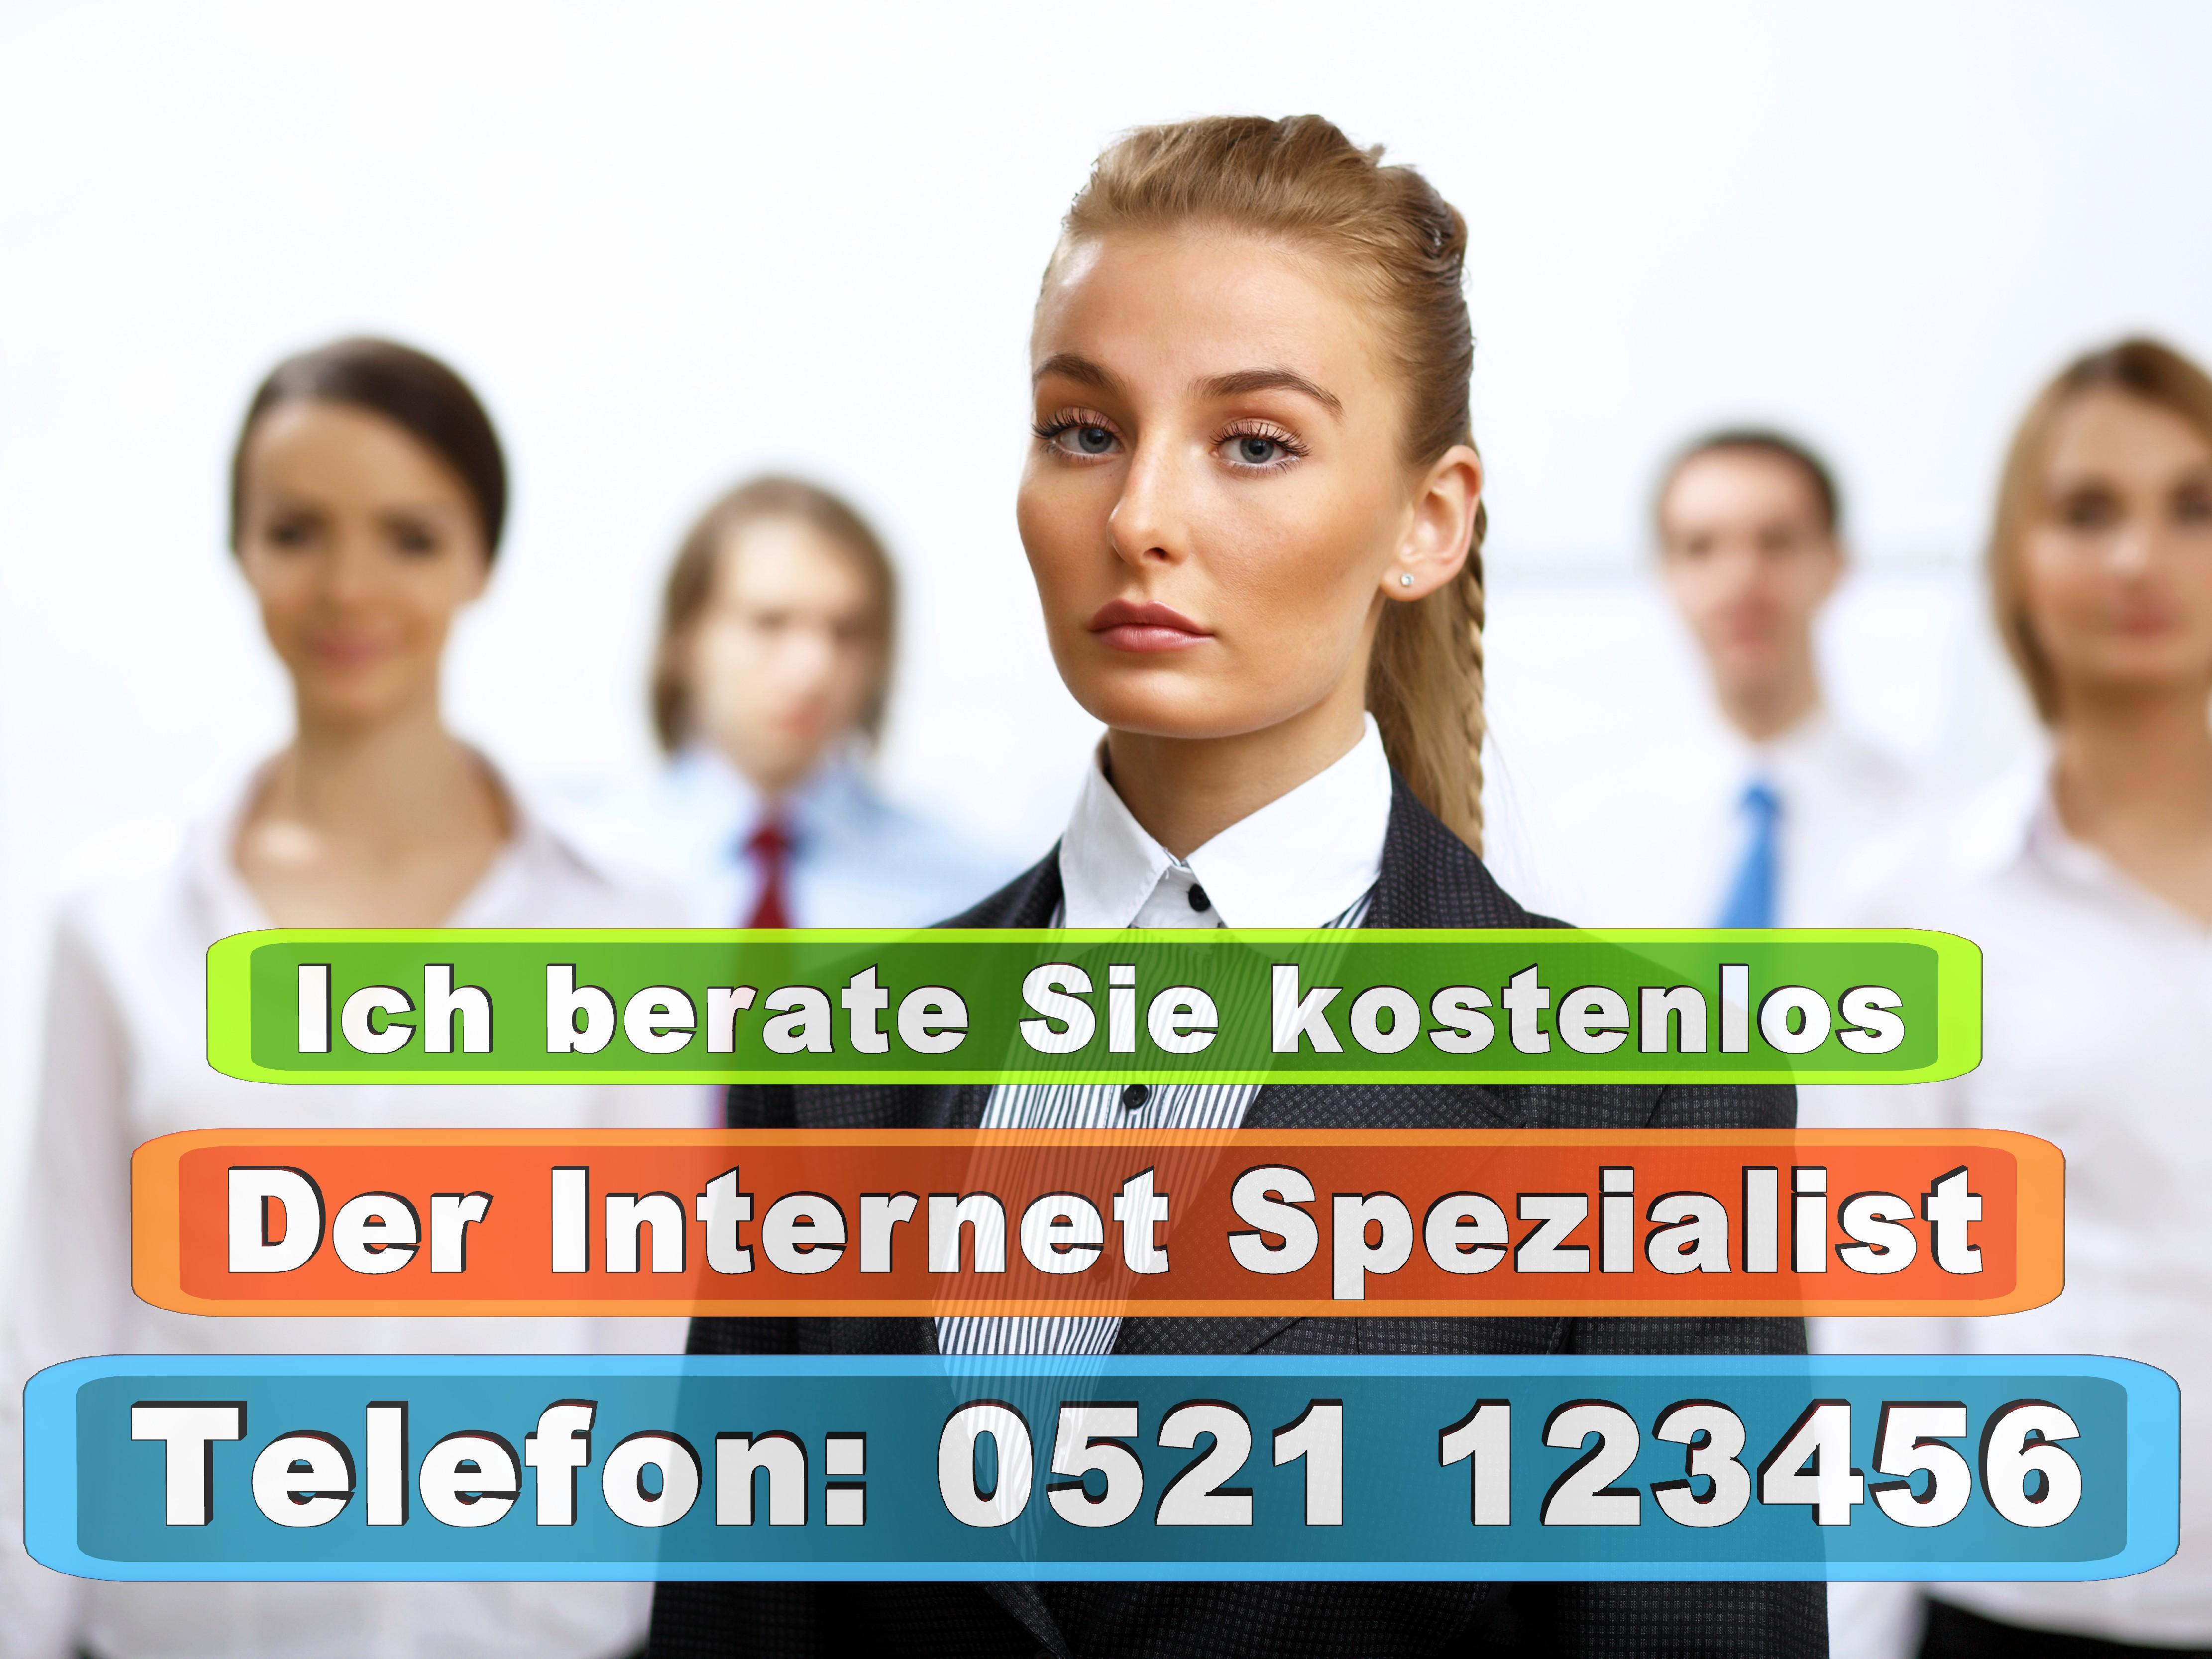 Rechtsanwalt In Bielefeld Steuerberater NRW OWL Paderborn Münster Dortmund Berlin Hamburg Düsseldorf Köln (1)